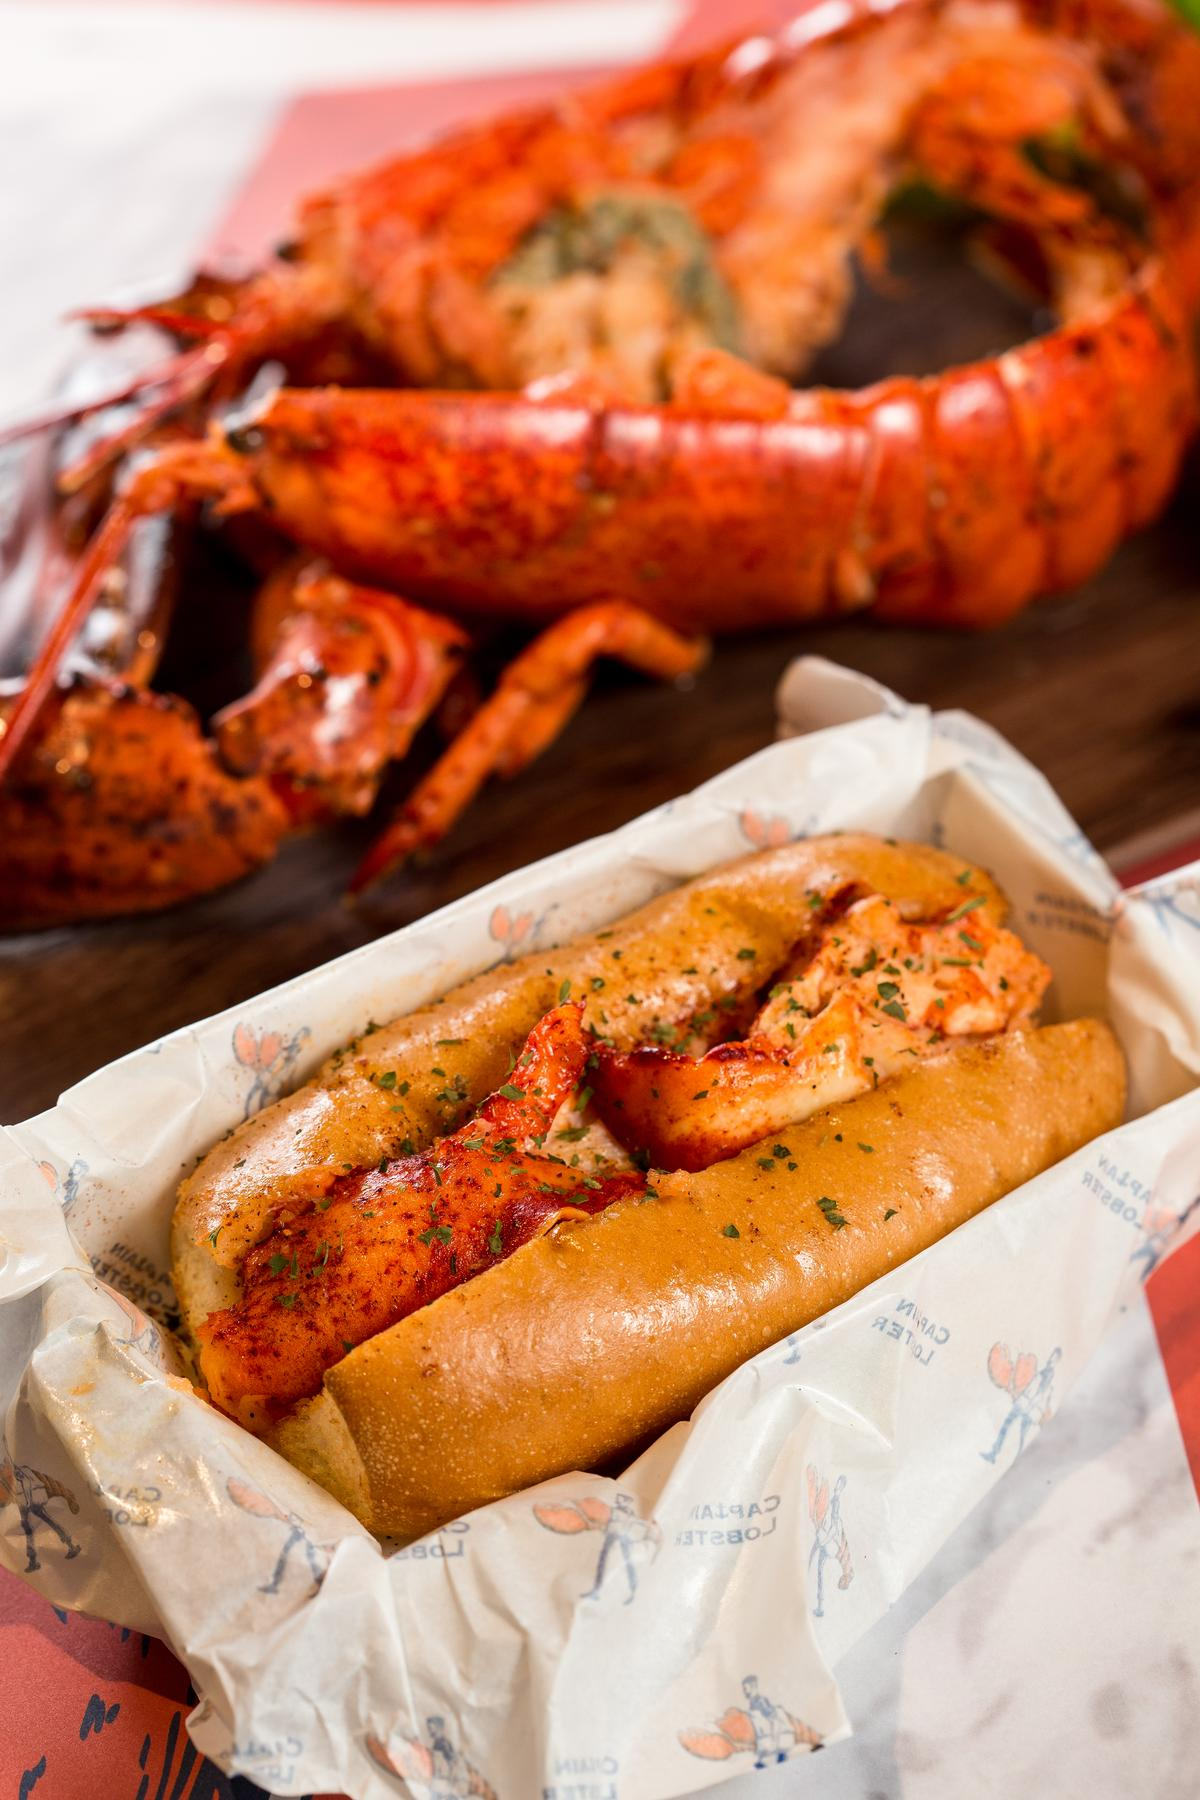 Captain Lobster的招牌龍蝦堡,放進當天現殺的龍蝦肉,鮮甜度十足。(加拿大龍蝦堡,380元/中份)